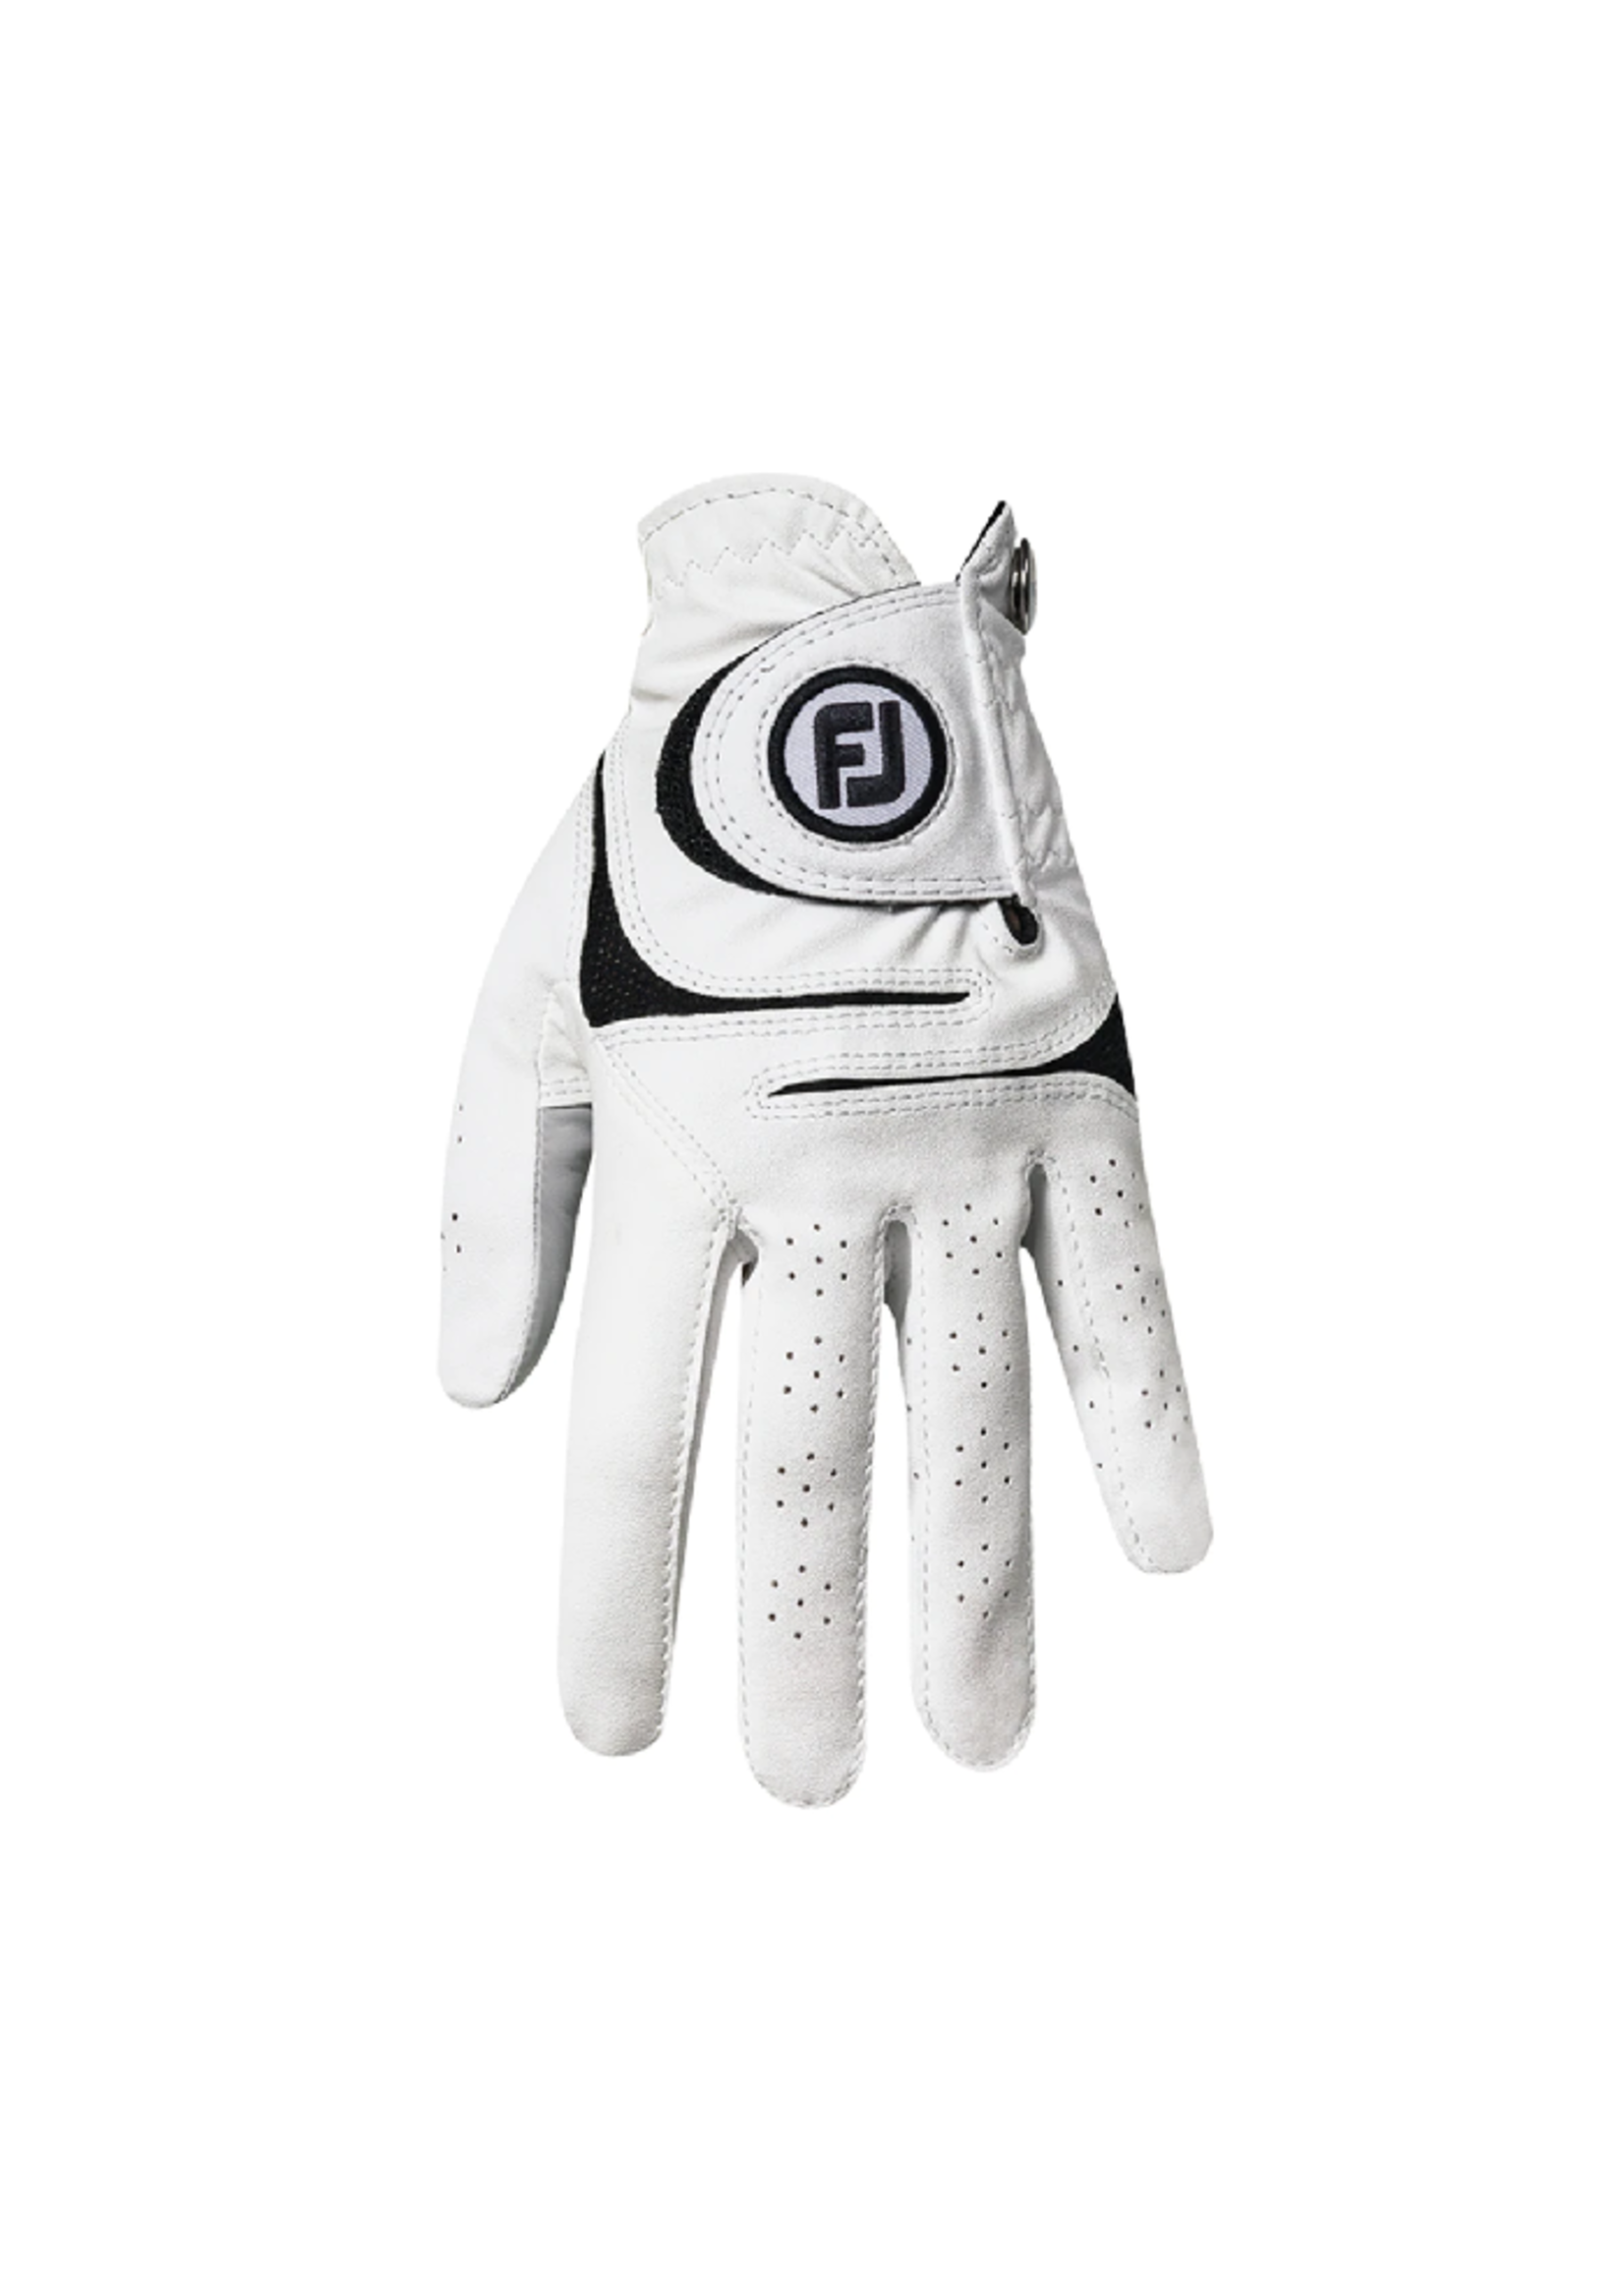 FJ Weathersof Glove Right Hand Women